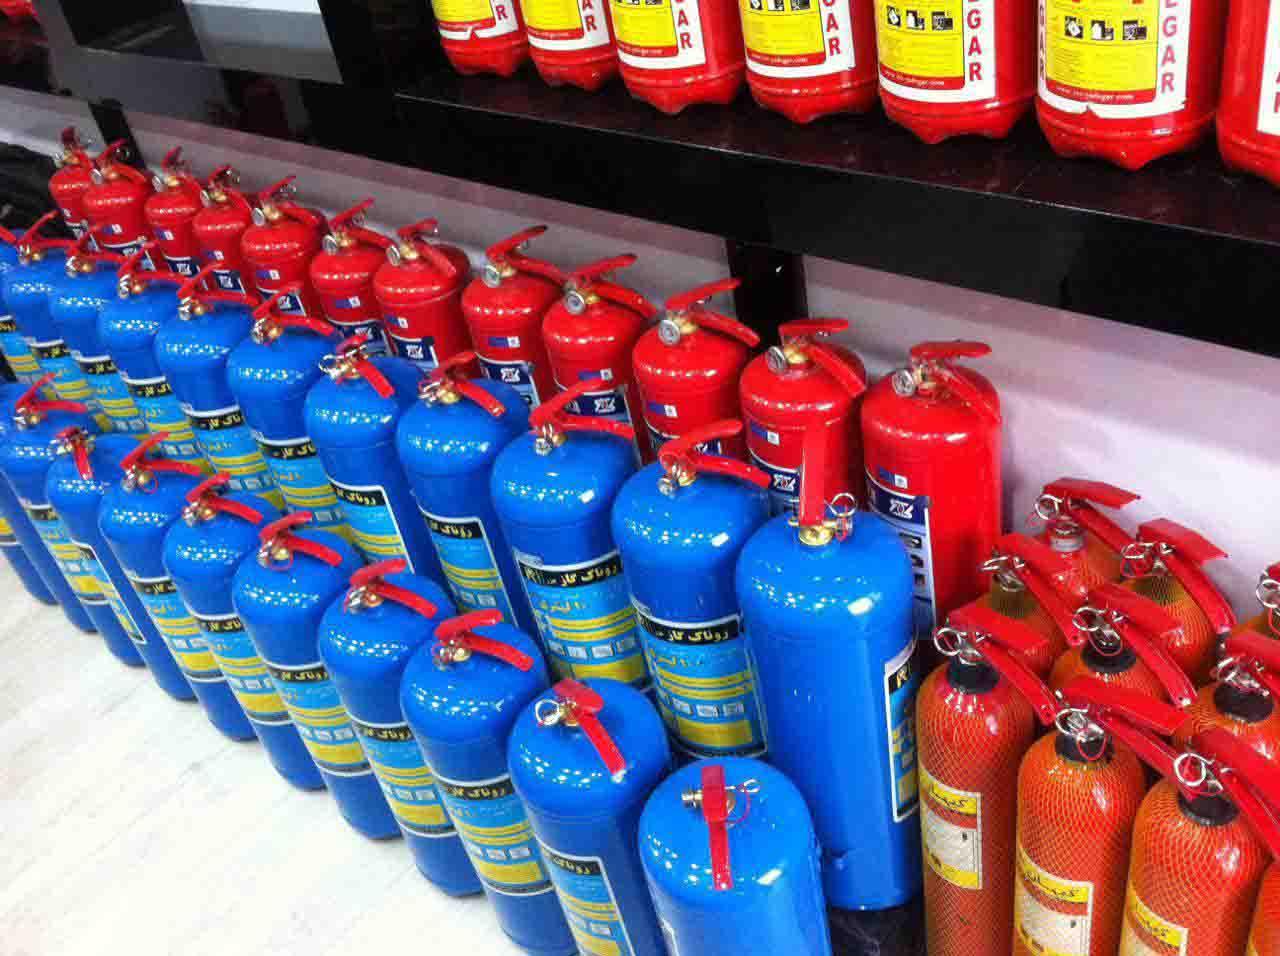 شارژ و فروش کپسول آتش نشانی زیر نظر مستقیم اتحادیه